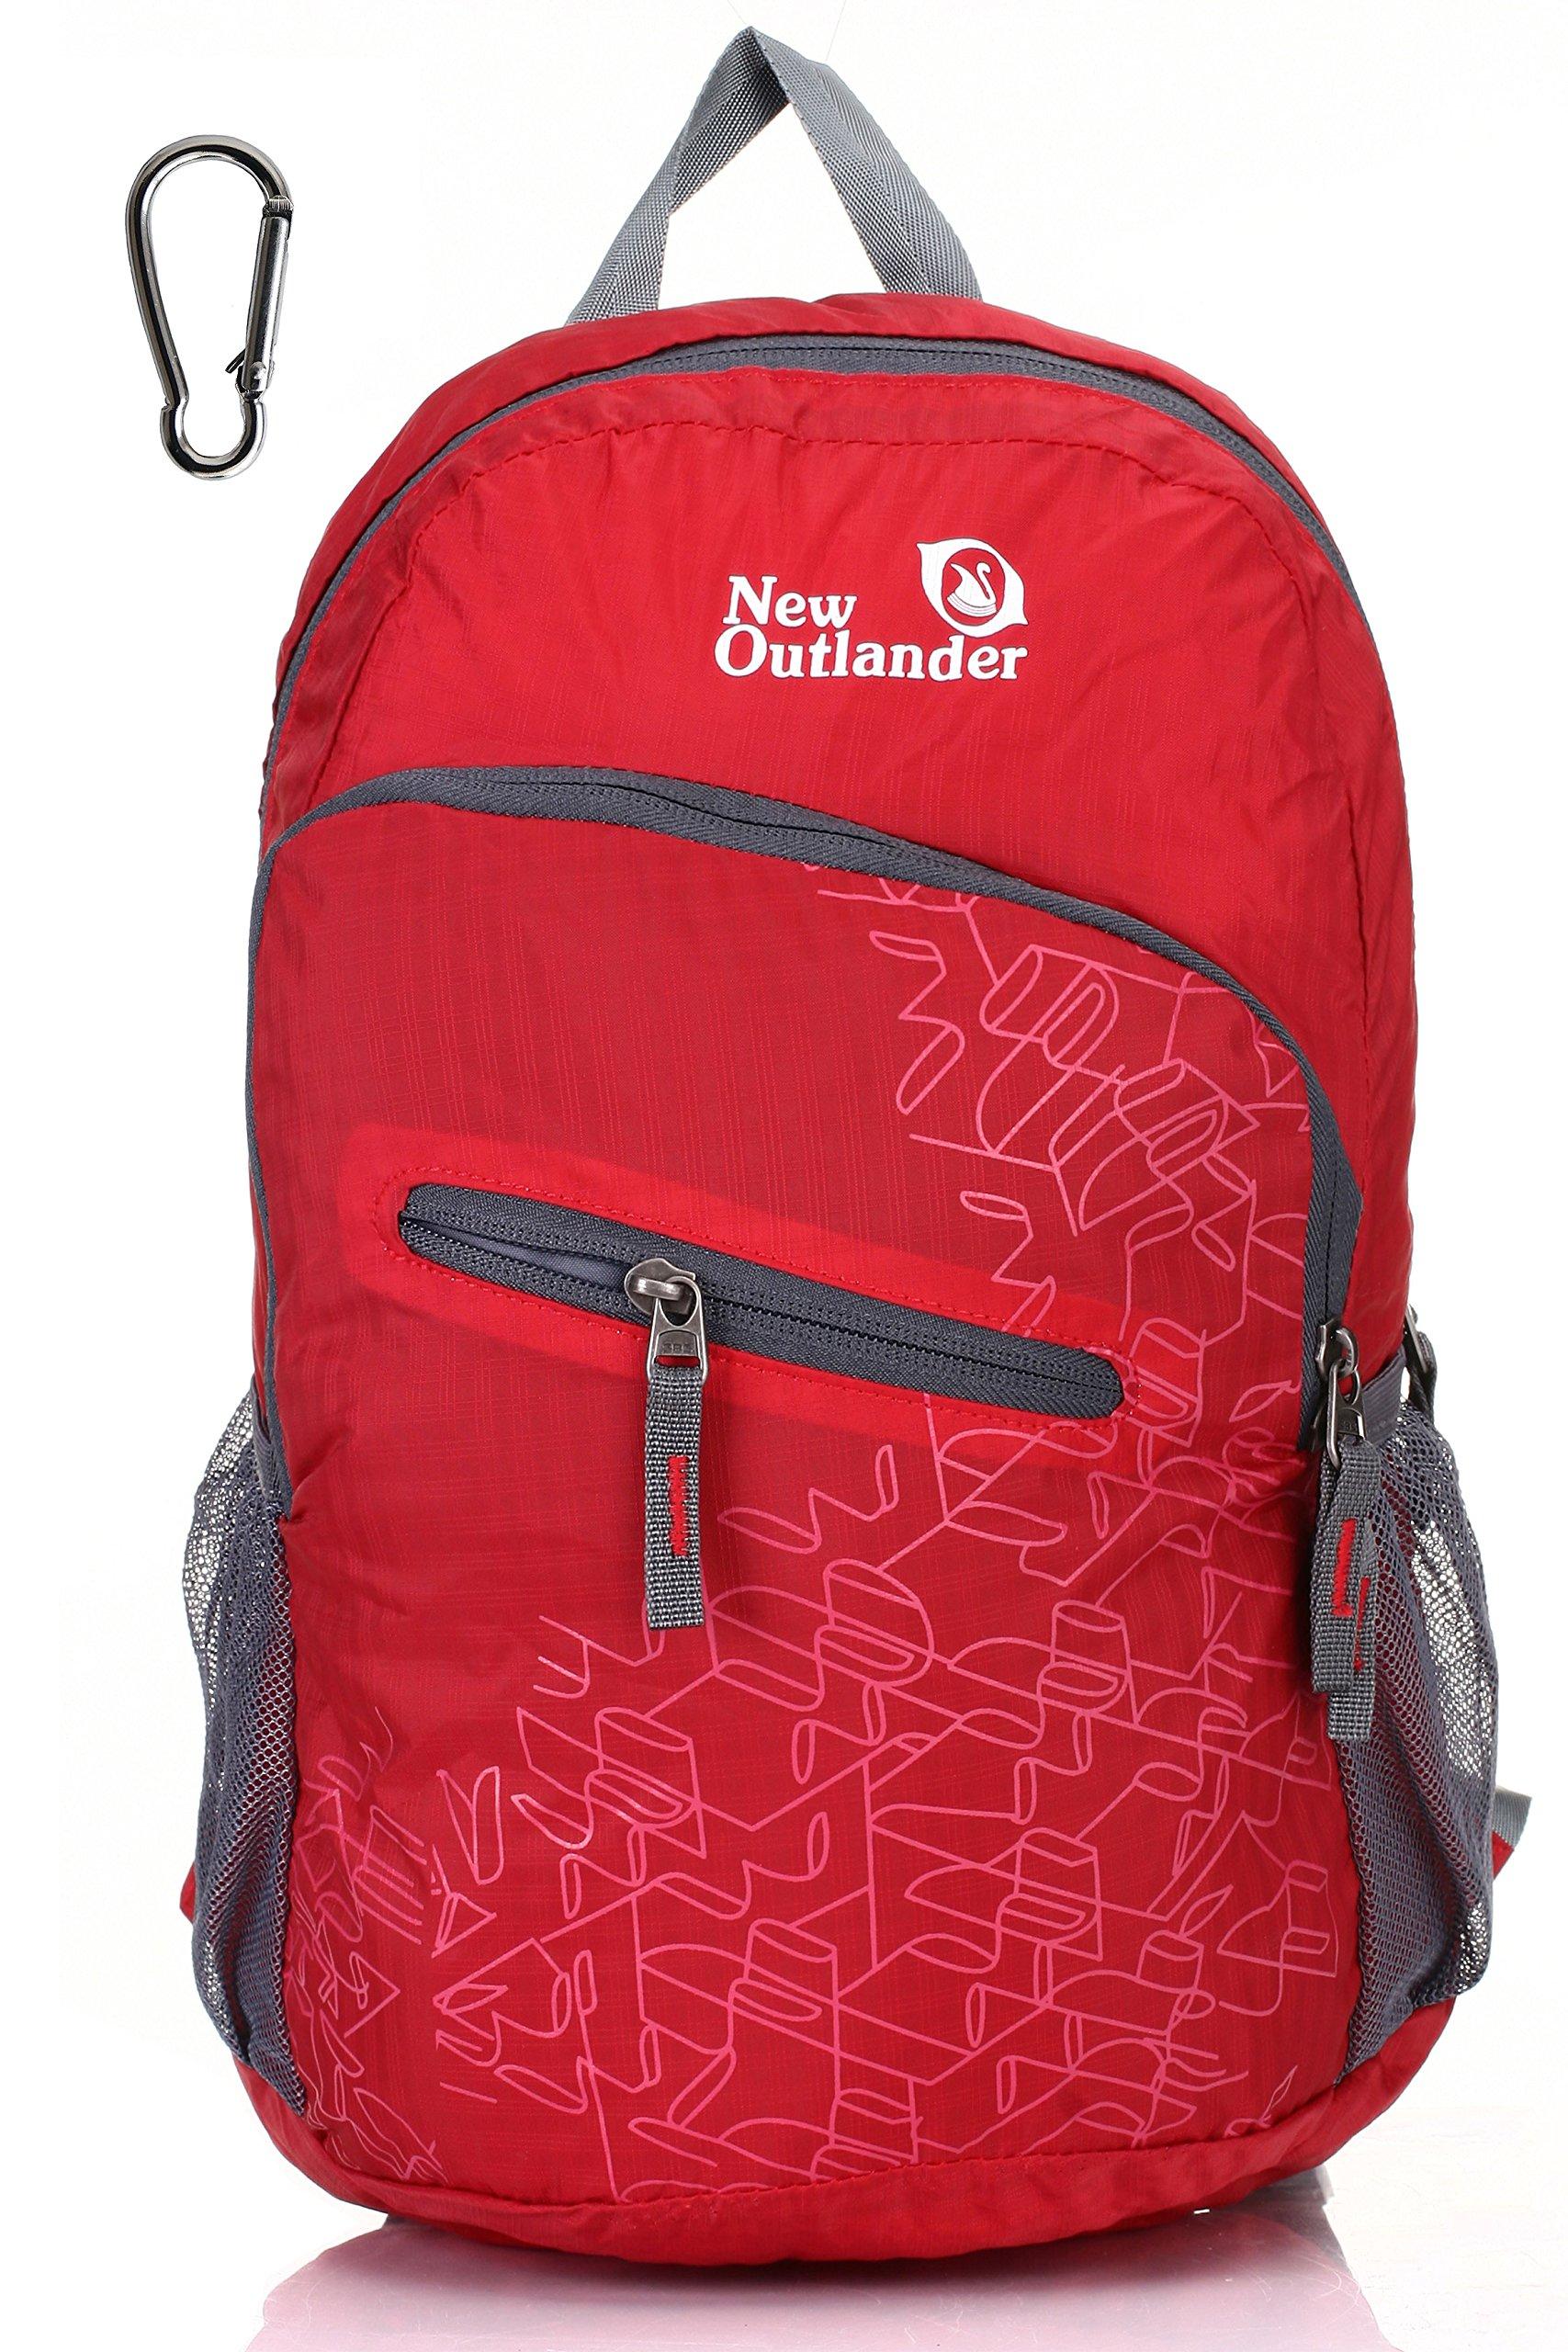 Outlander Packable Handy Lightweight Travel Hiking Backpack Daypack-Red-L